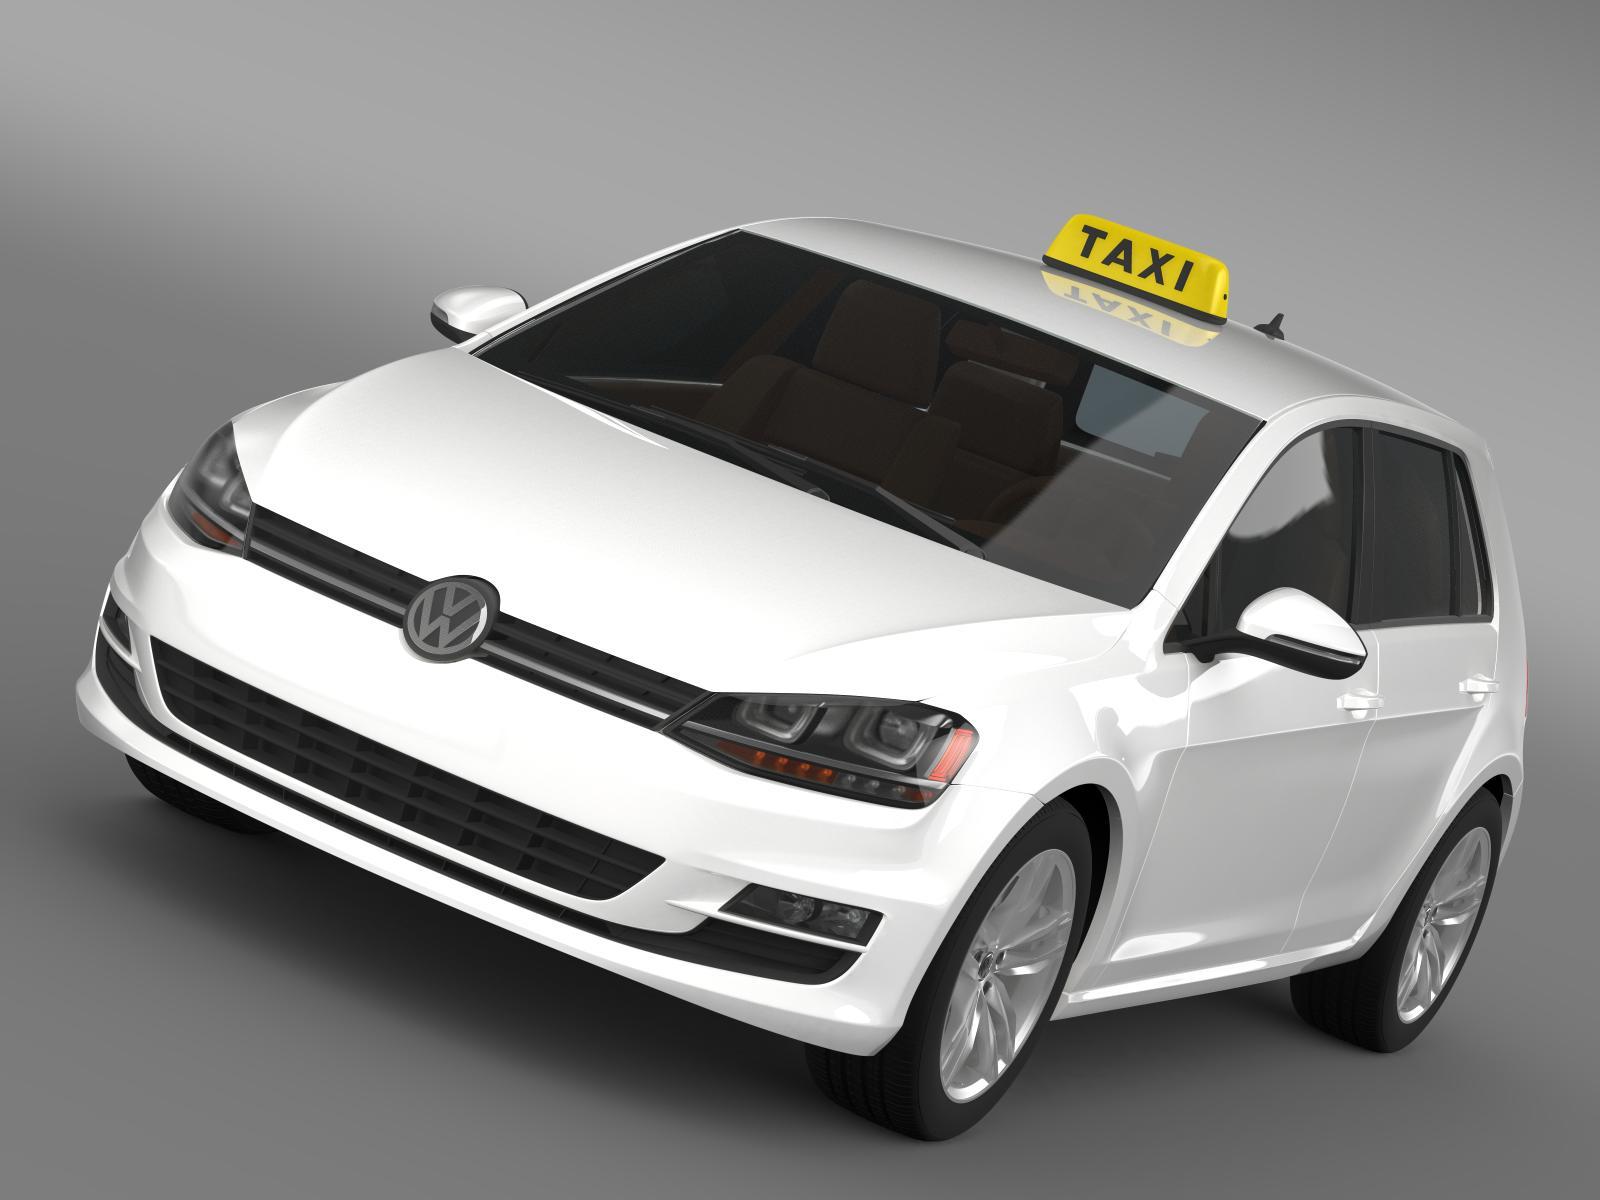 Volkswagen golf tsi leigubíl 3d líkan 3ds hámark fbx c4d lwo m mb hrc xsi obj 204144